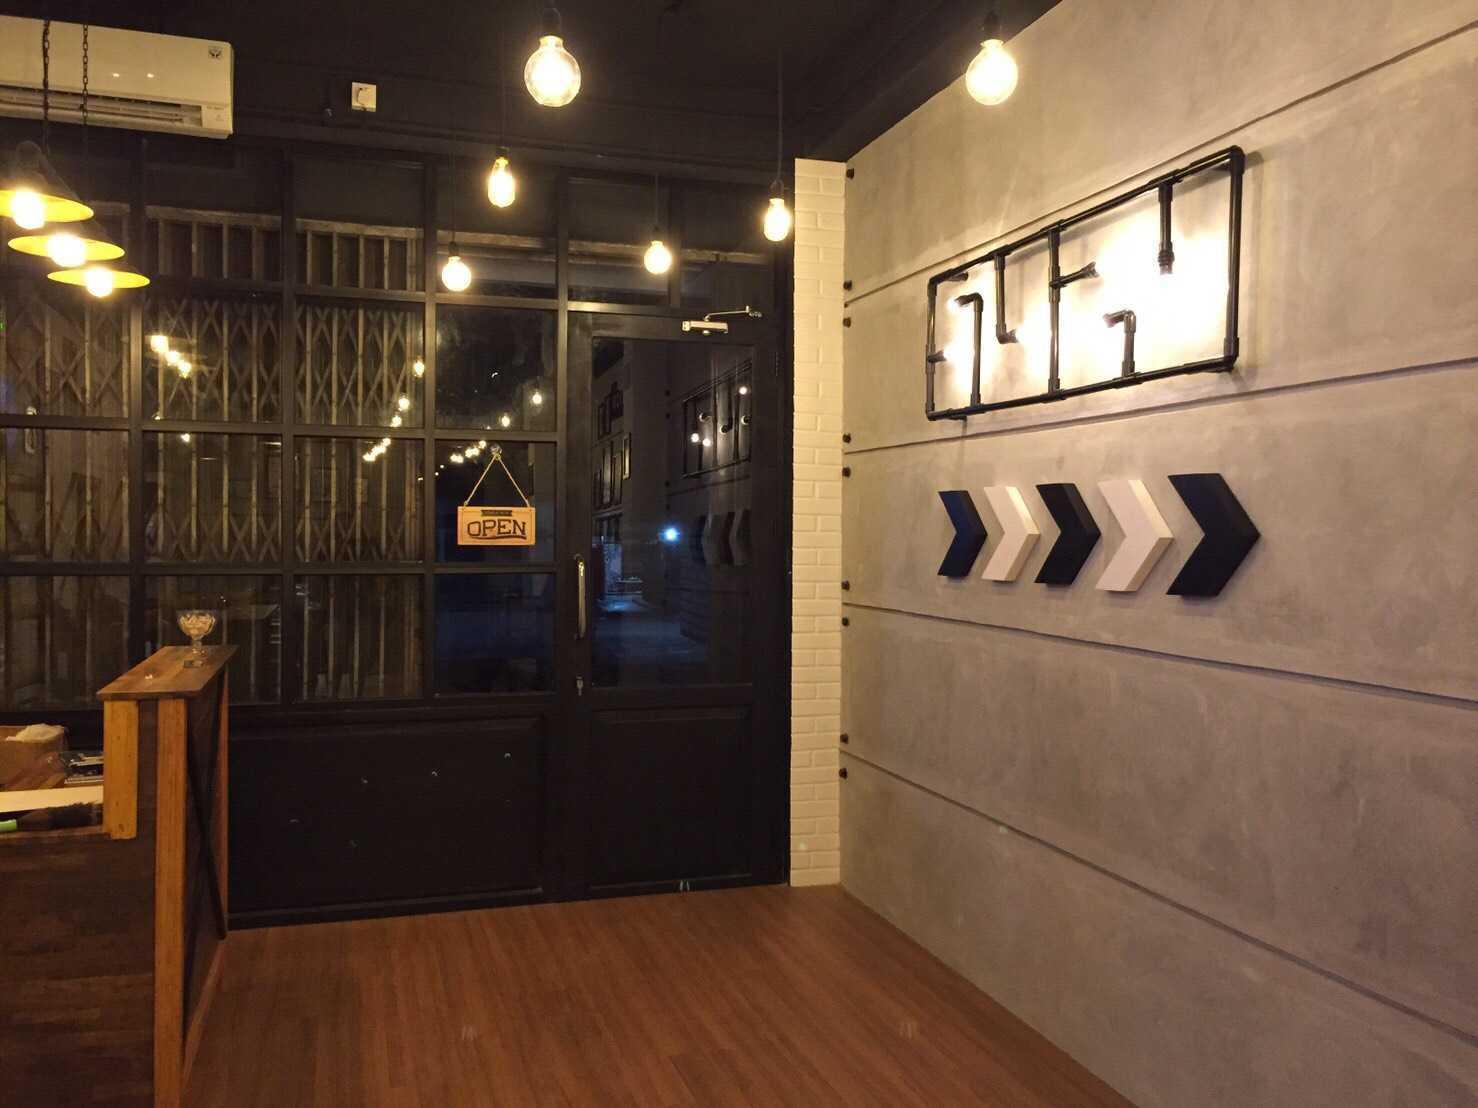 Foto inspirasi ide desain pintu masuk klasik Entrance area oleh Archipelago Interior Design & Construction di Arsitag